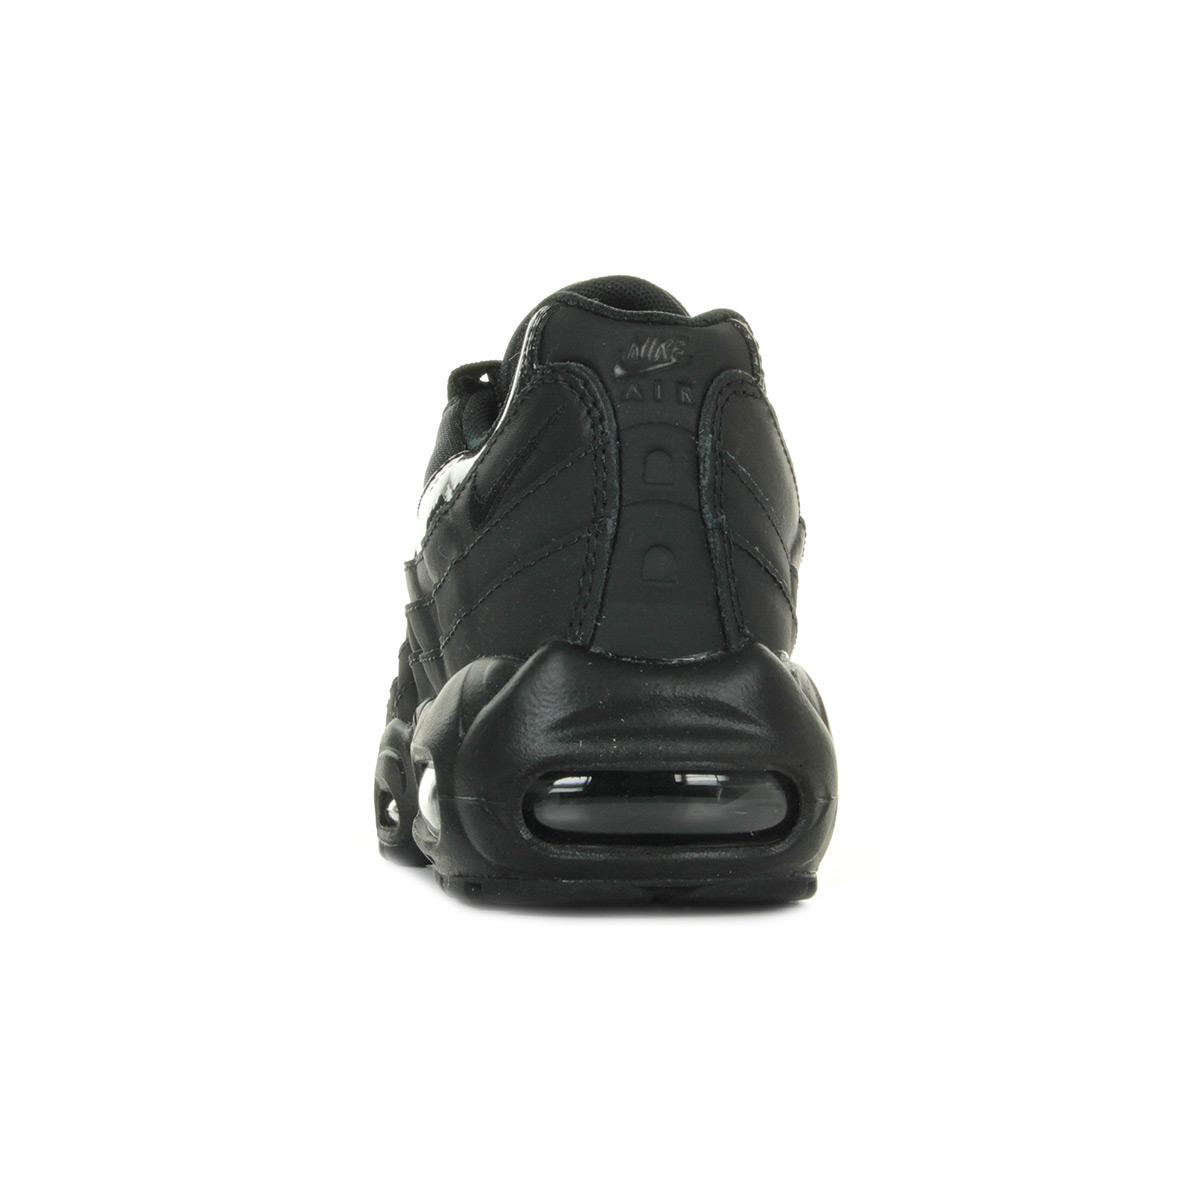 Nike WMNS Air Max 95 307960010, Baskets mode femme